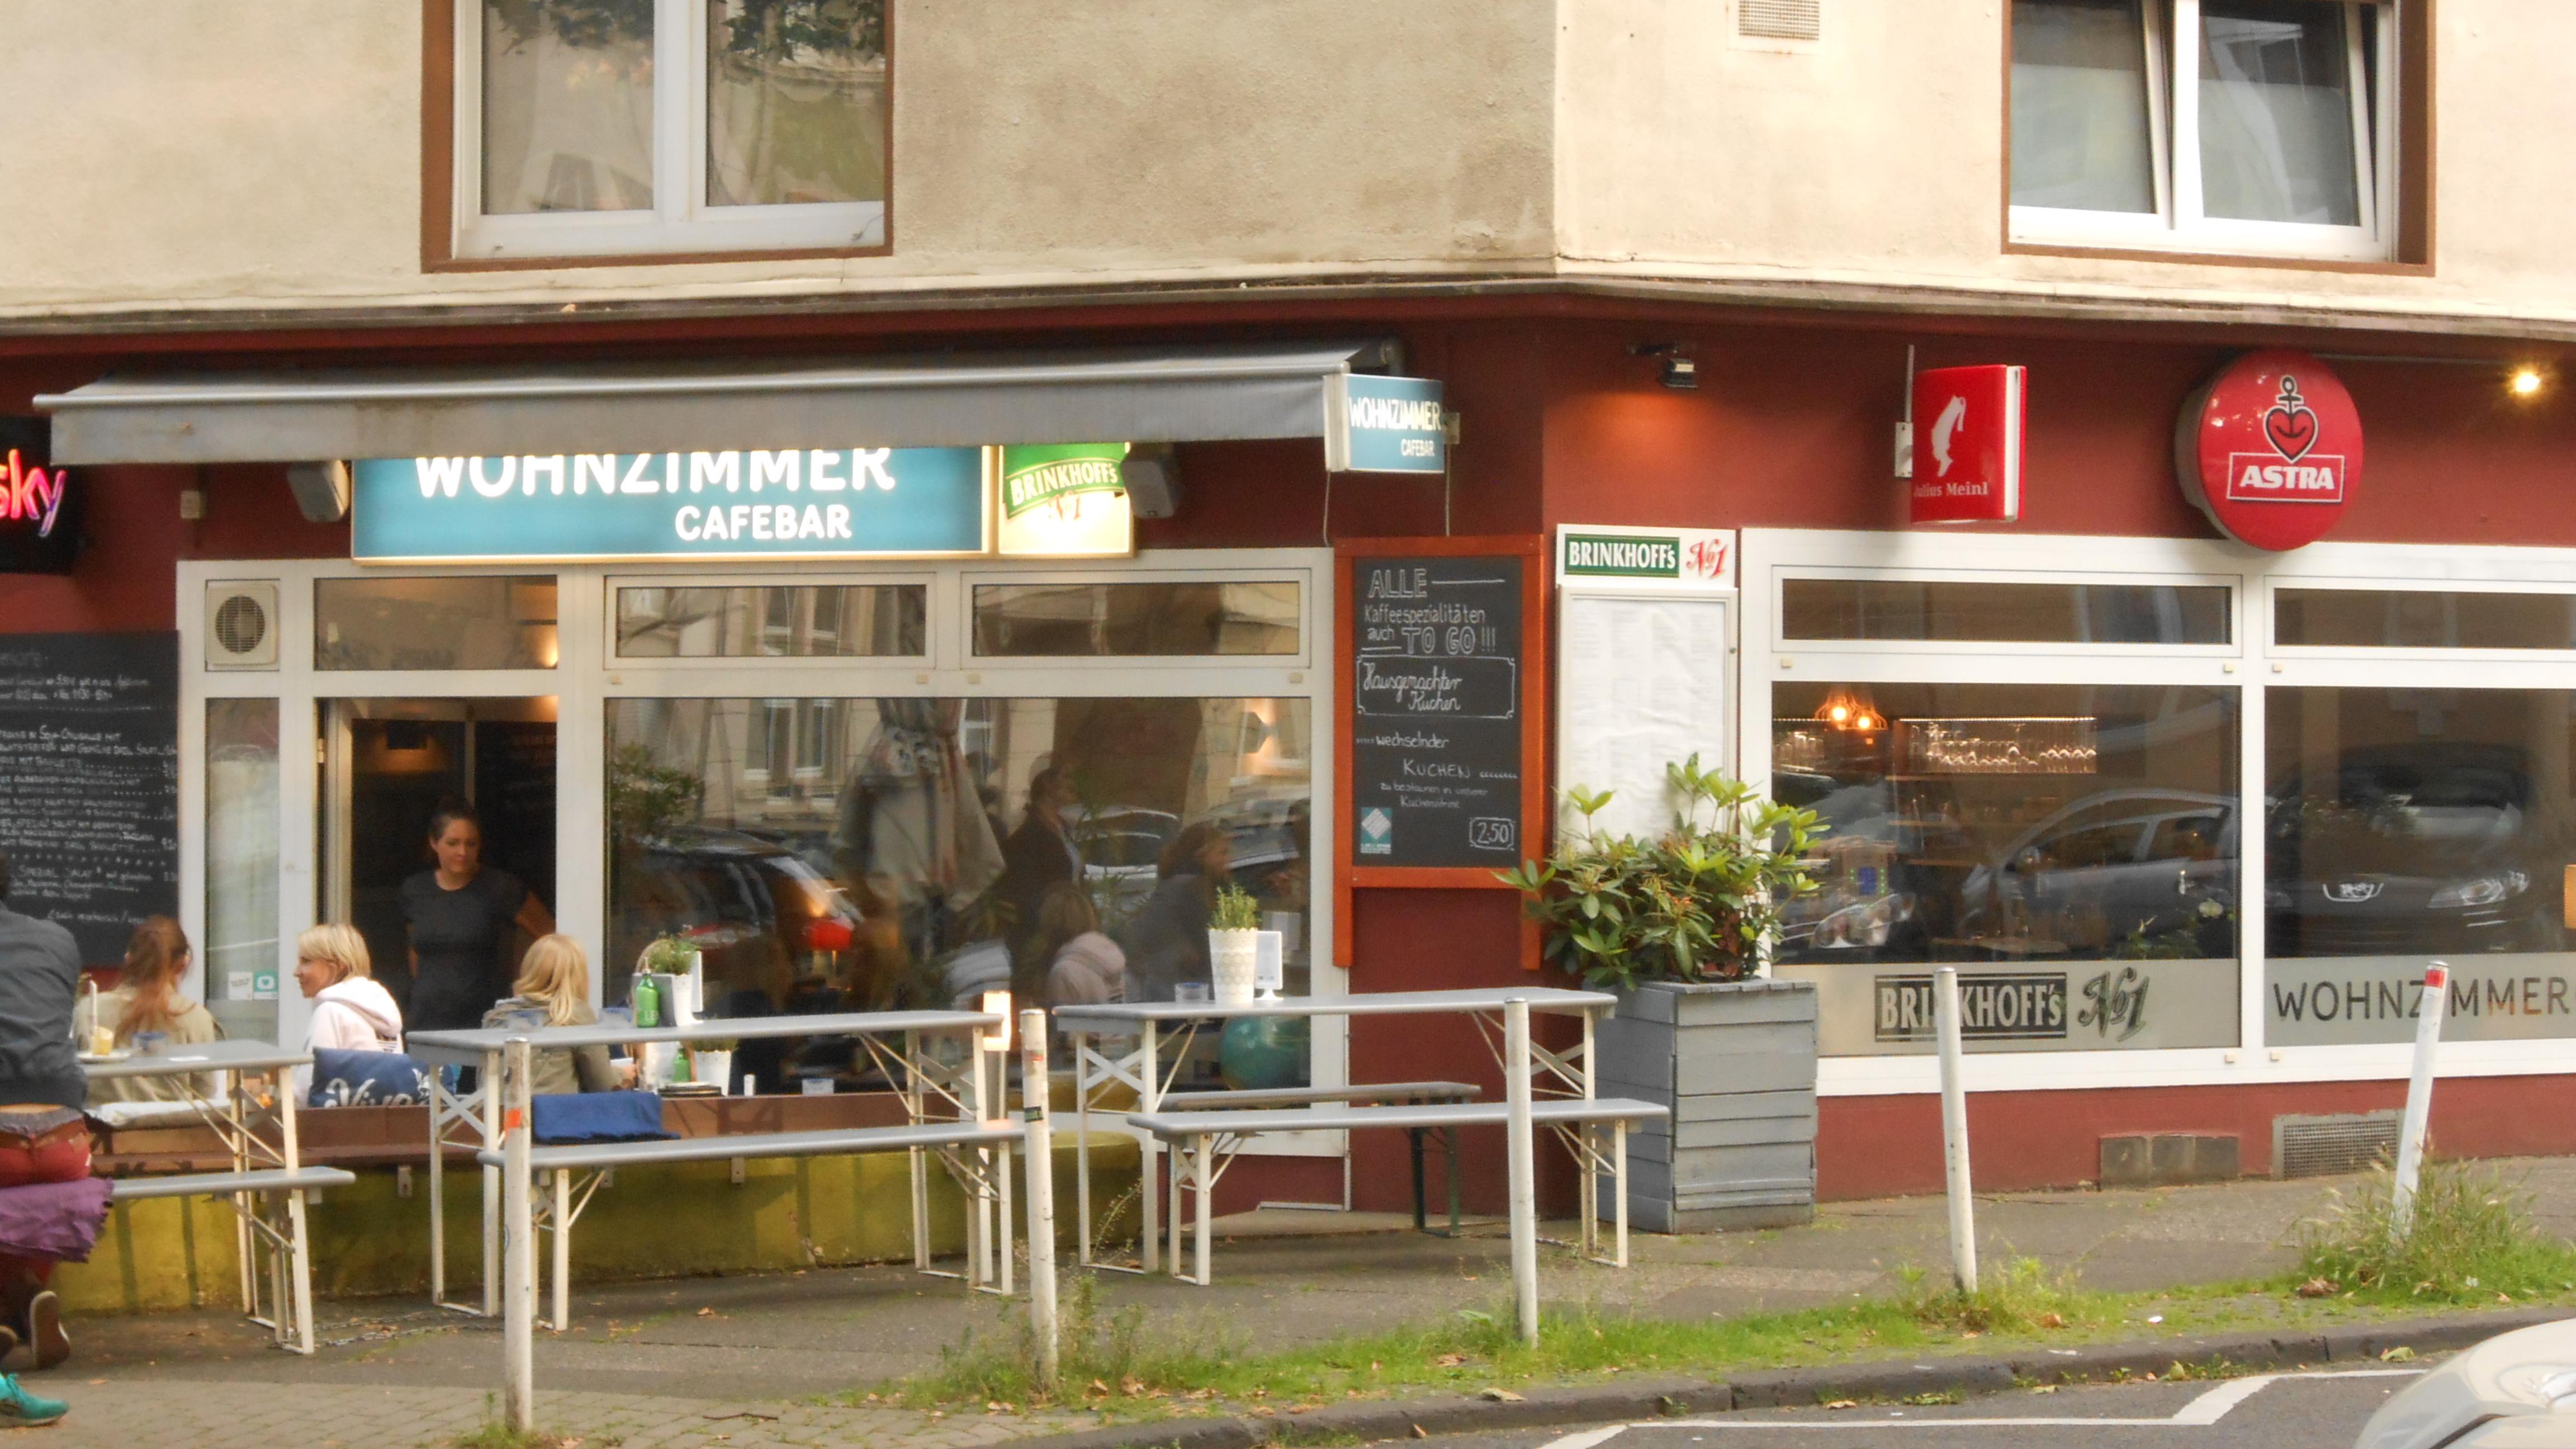 File Wohnzimmer Cafebar Dortmund 1 Jpg Wikimedia Commons